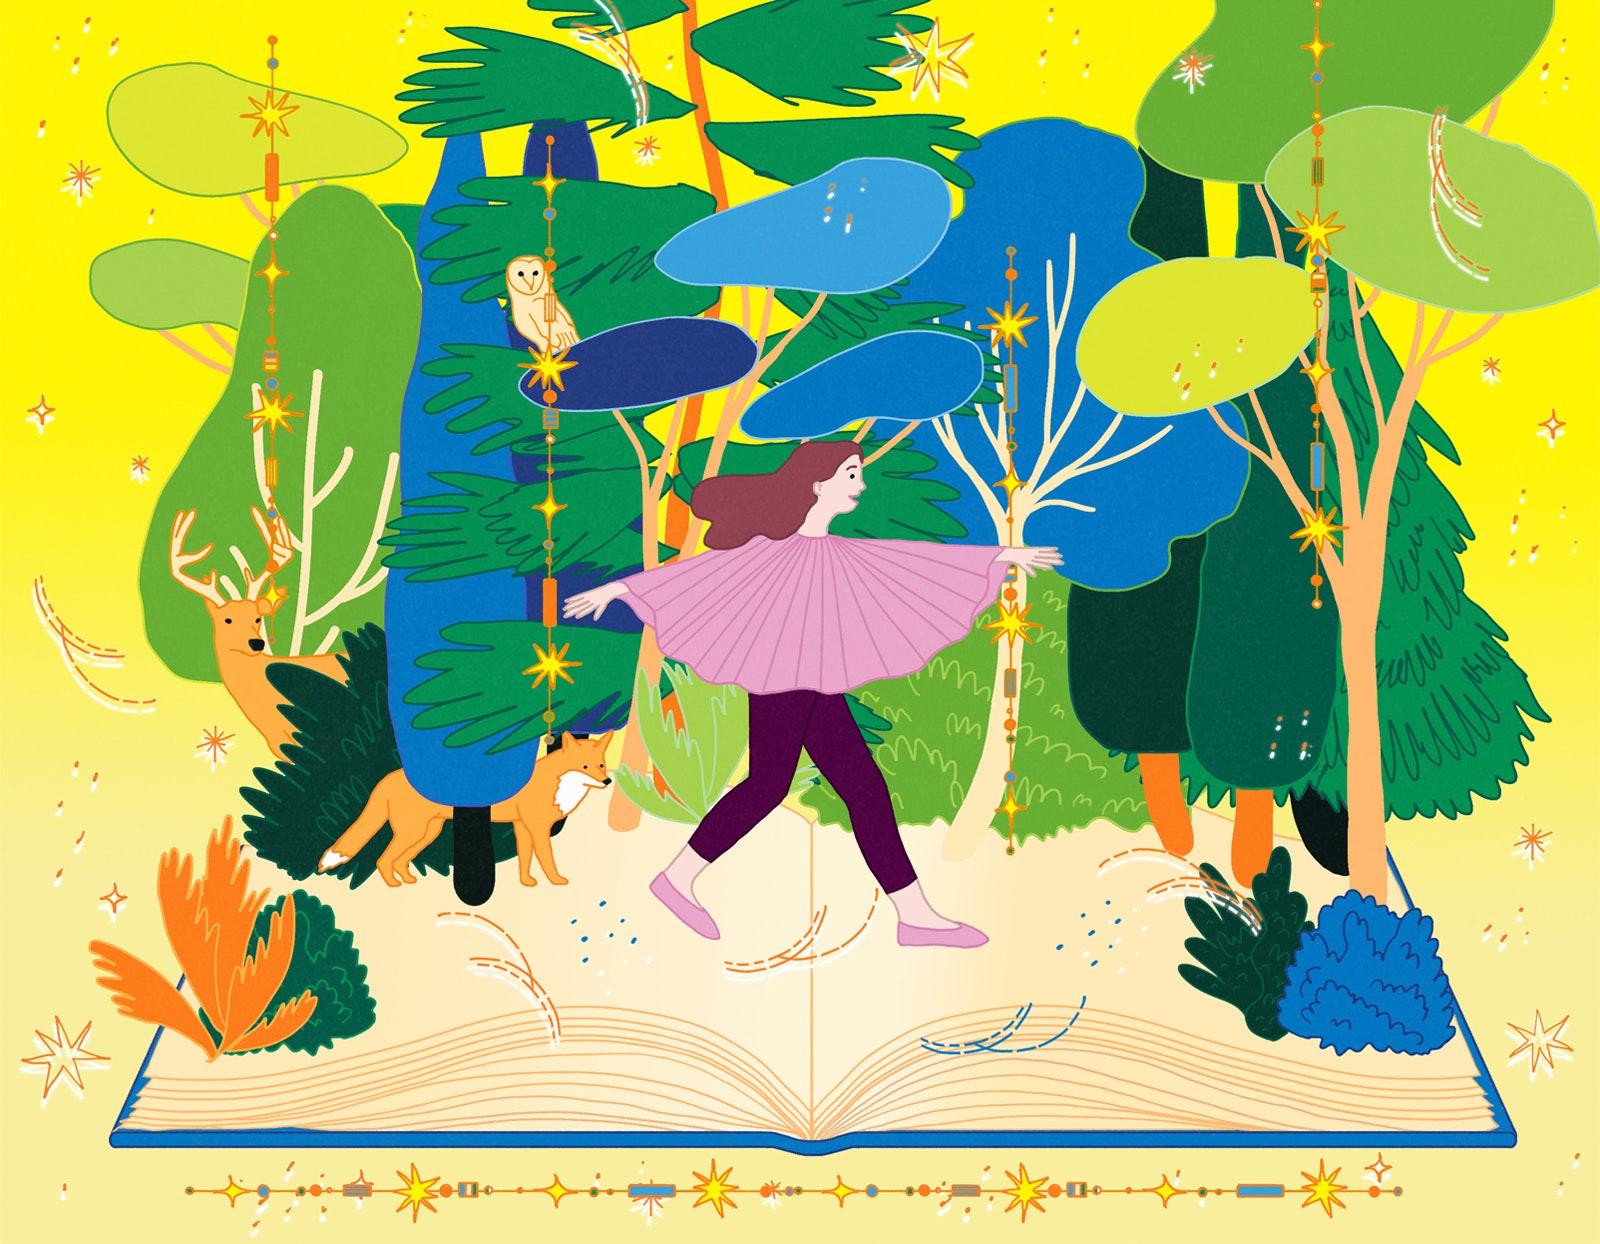 MILICA GOLUBOVIC - Fairytale web